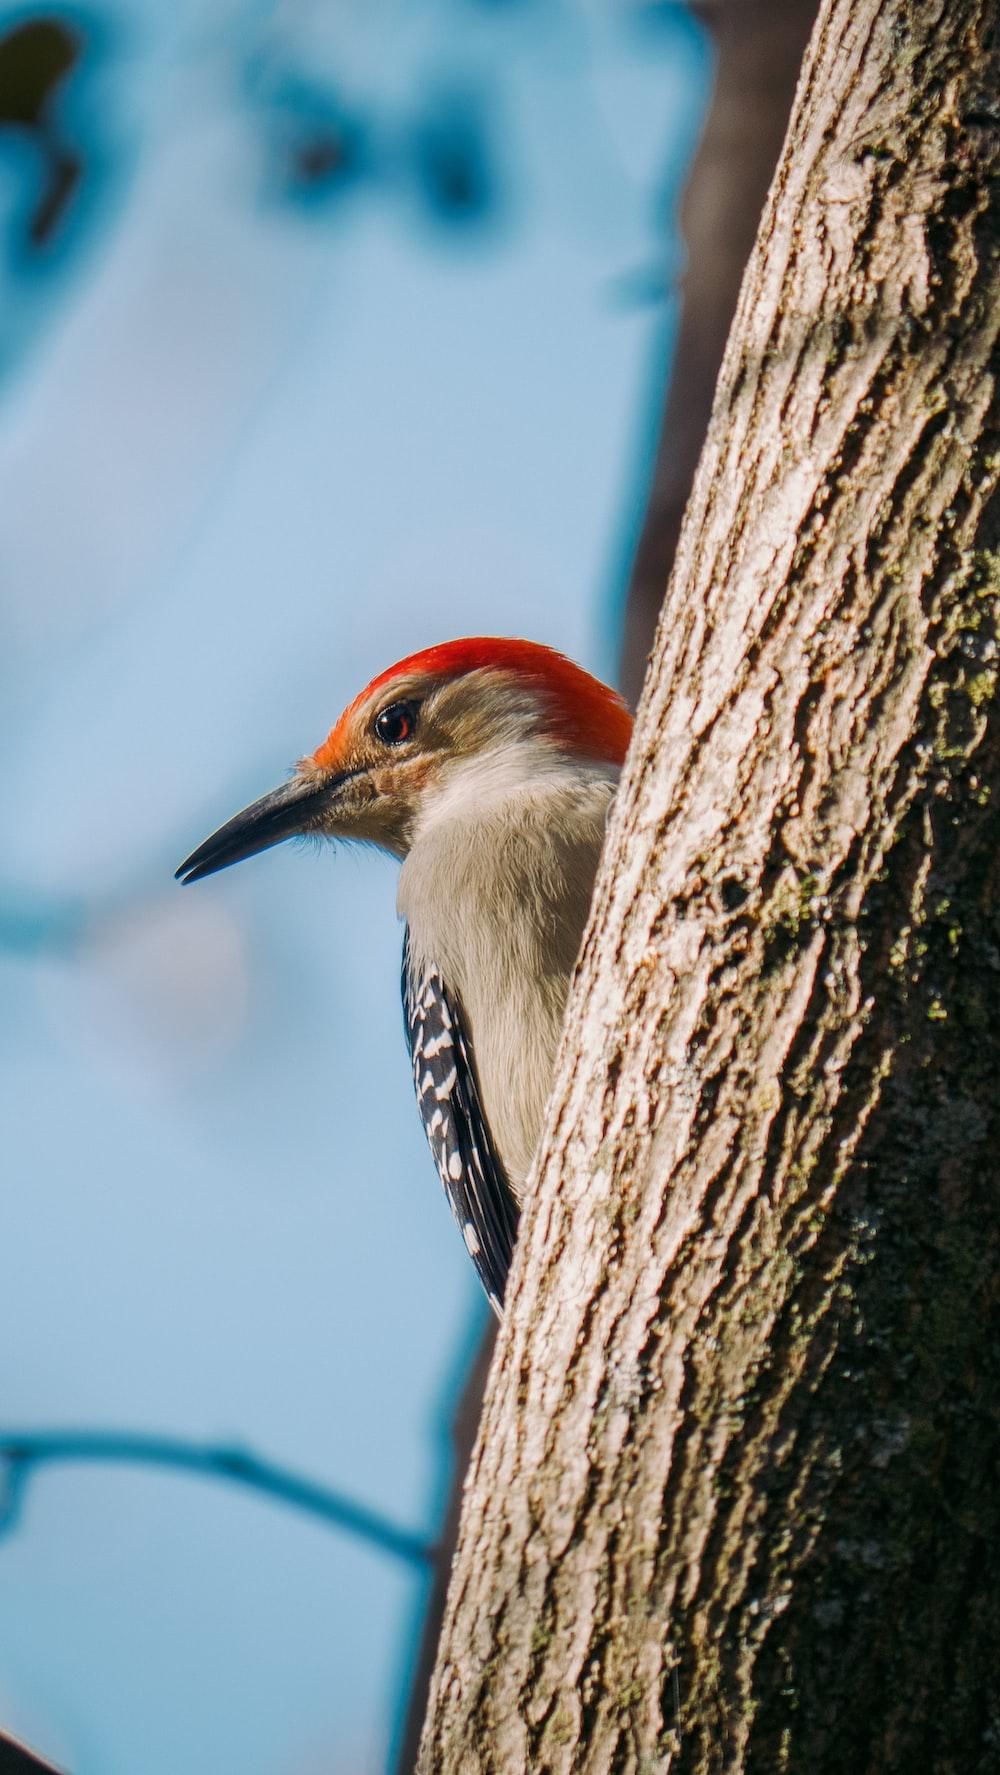 white black and orange bird on brown tree branch during daytime